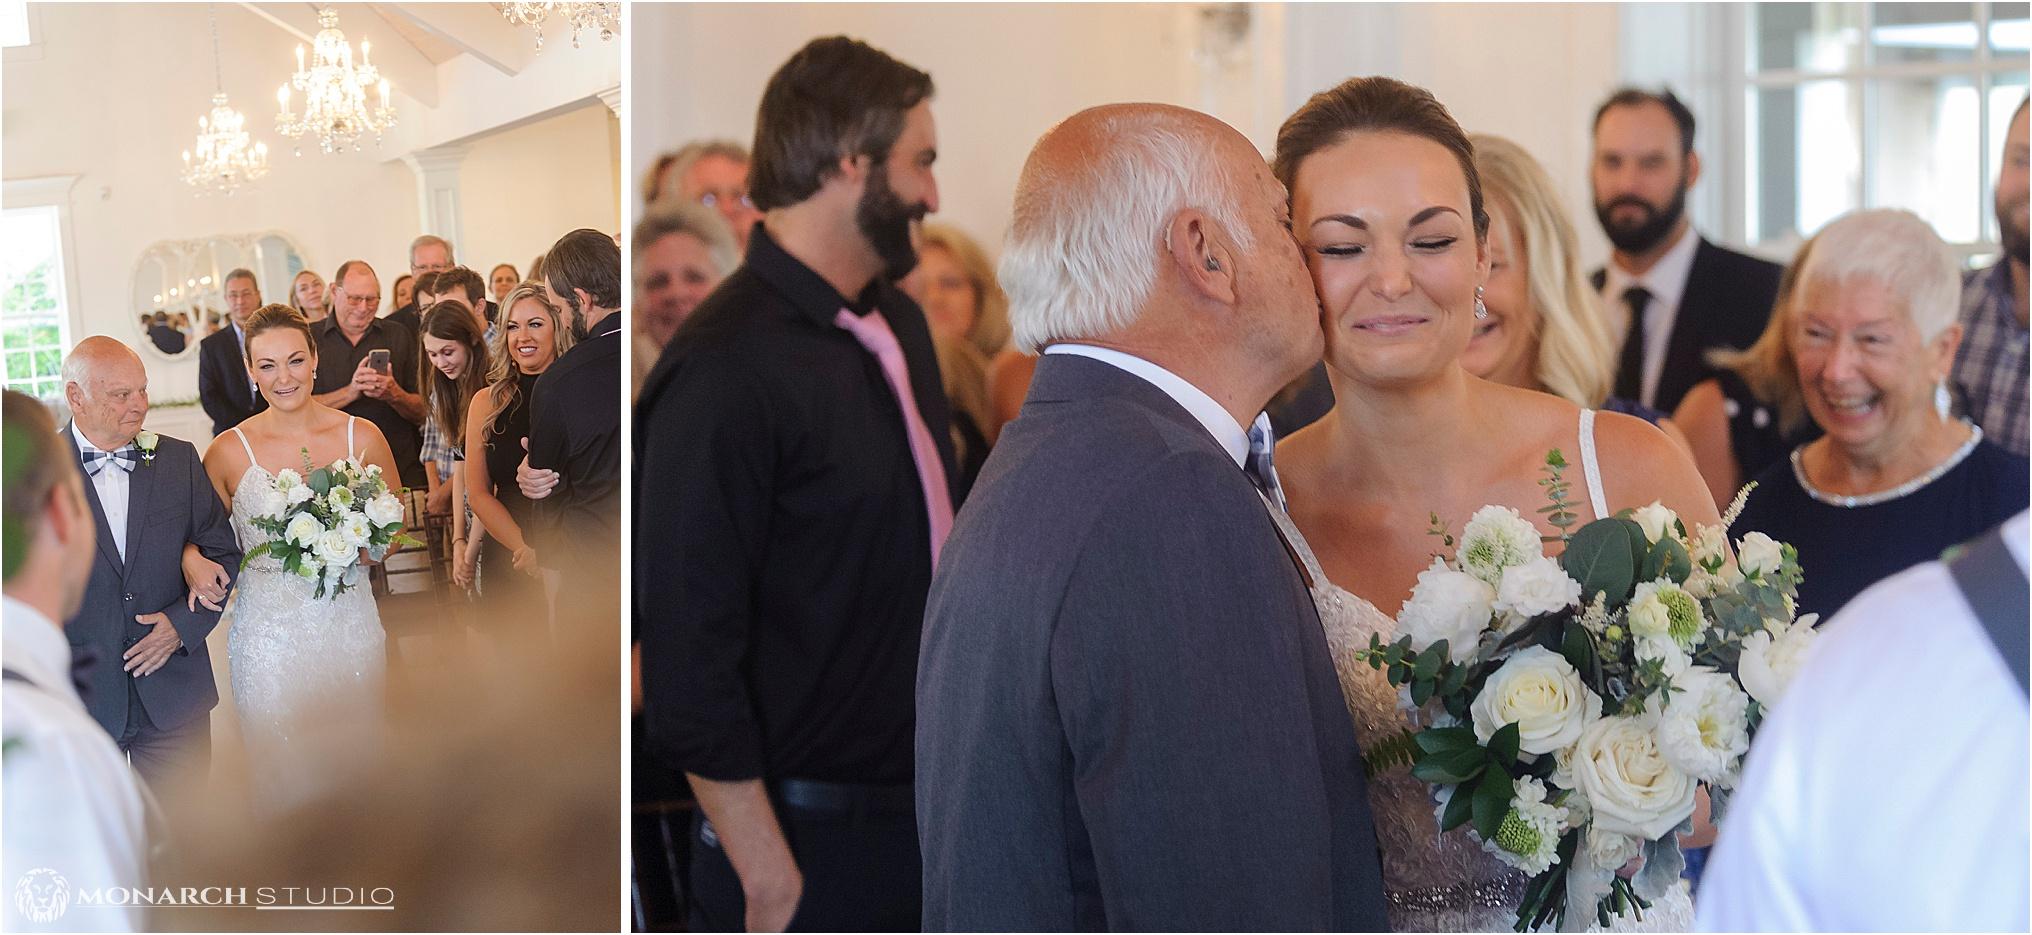 068-whiteroom-wedding-photographer-2019-05-22_0050.jpg